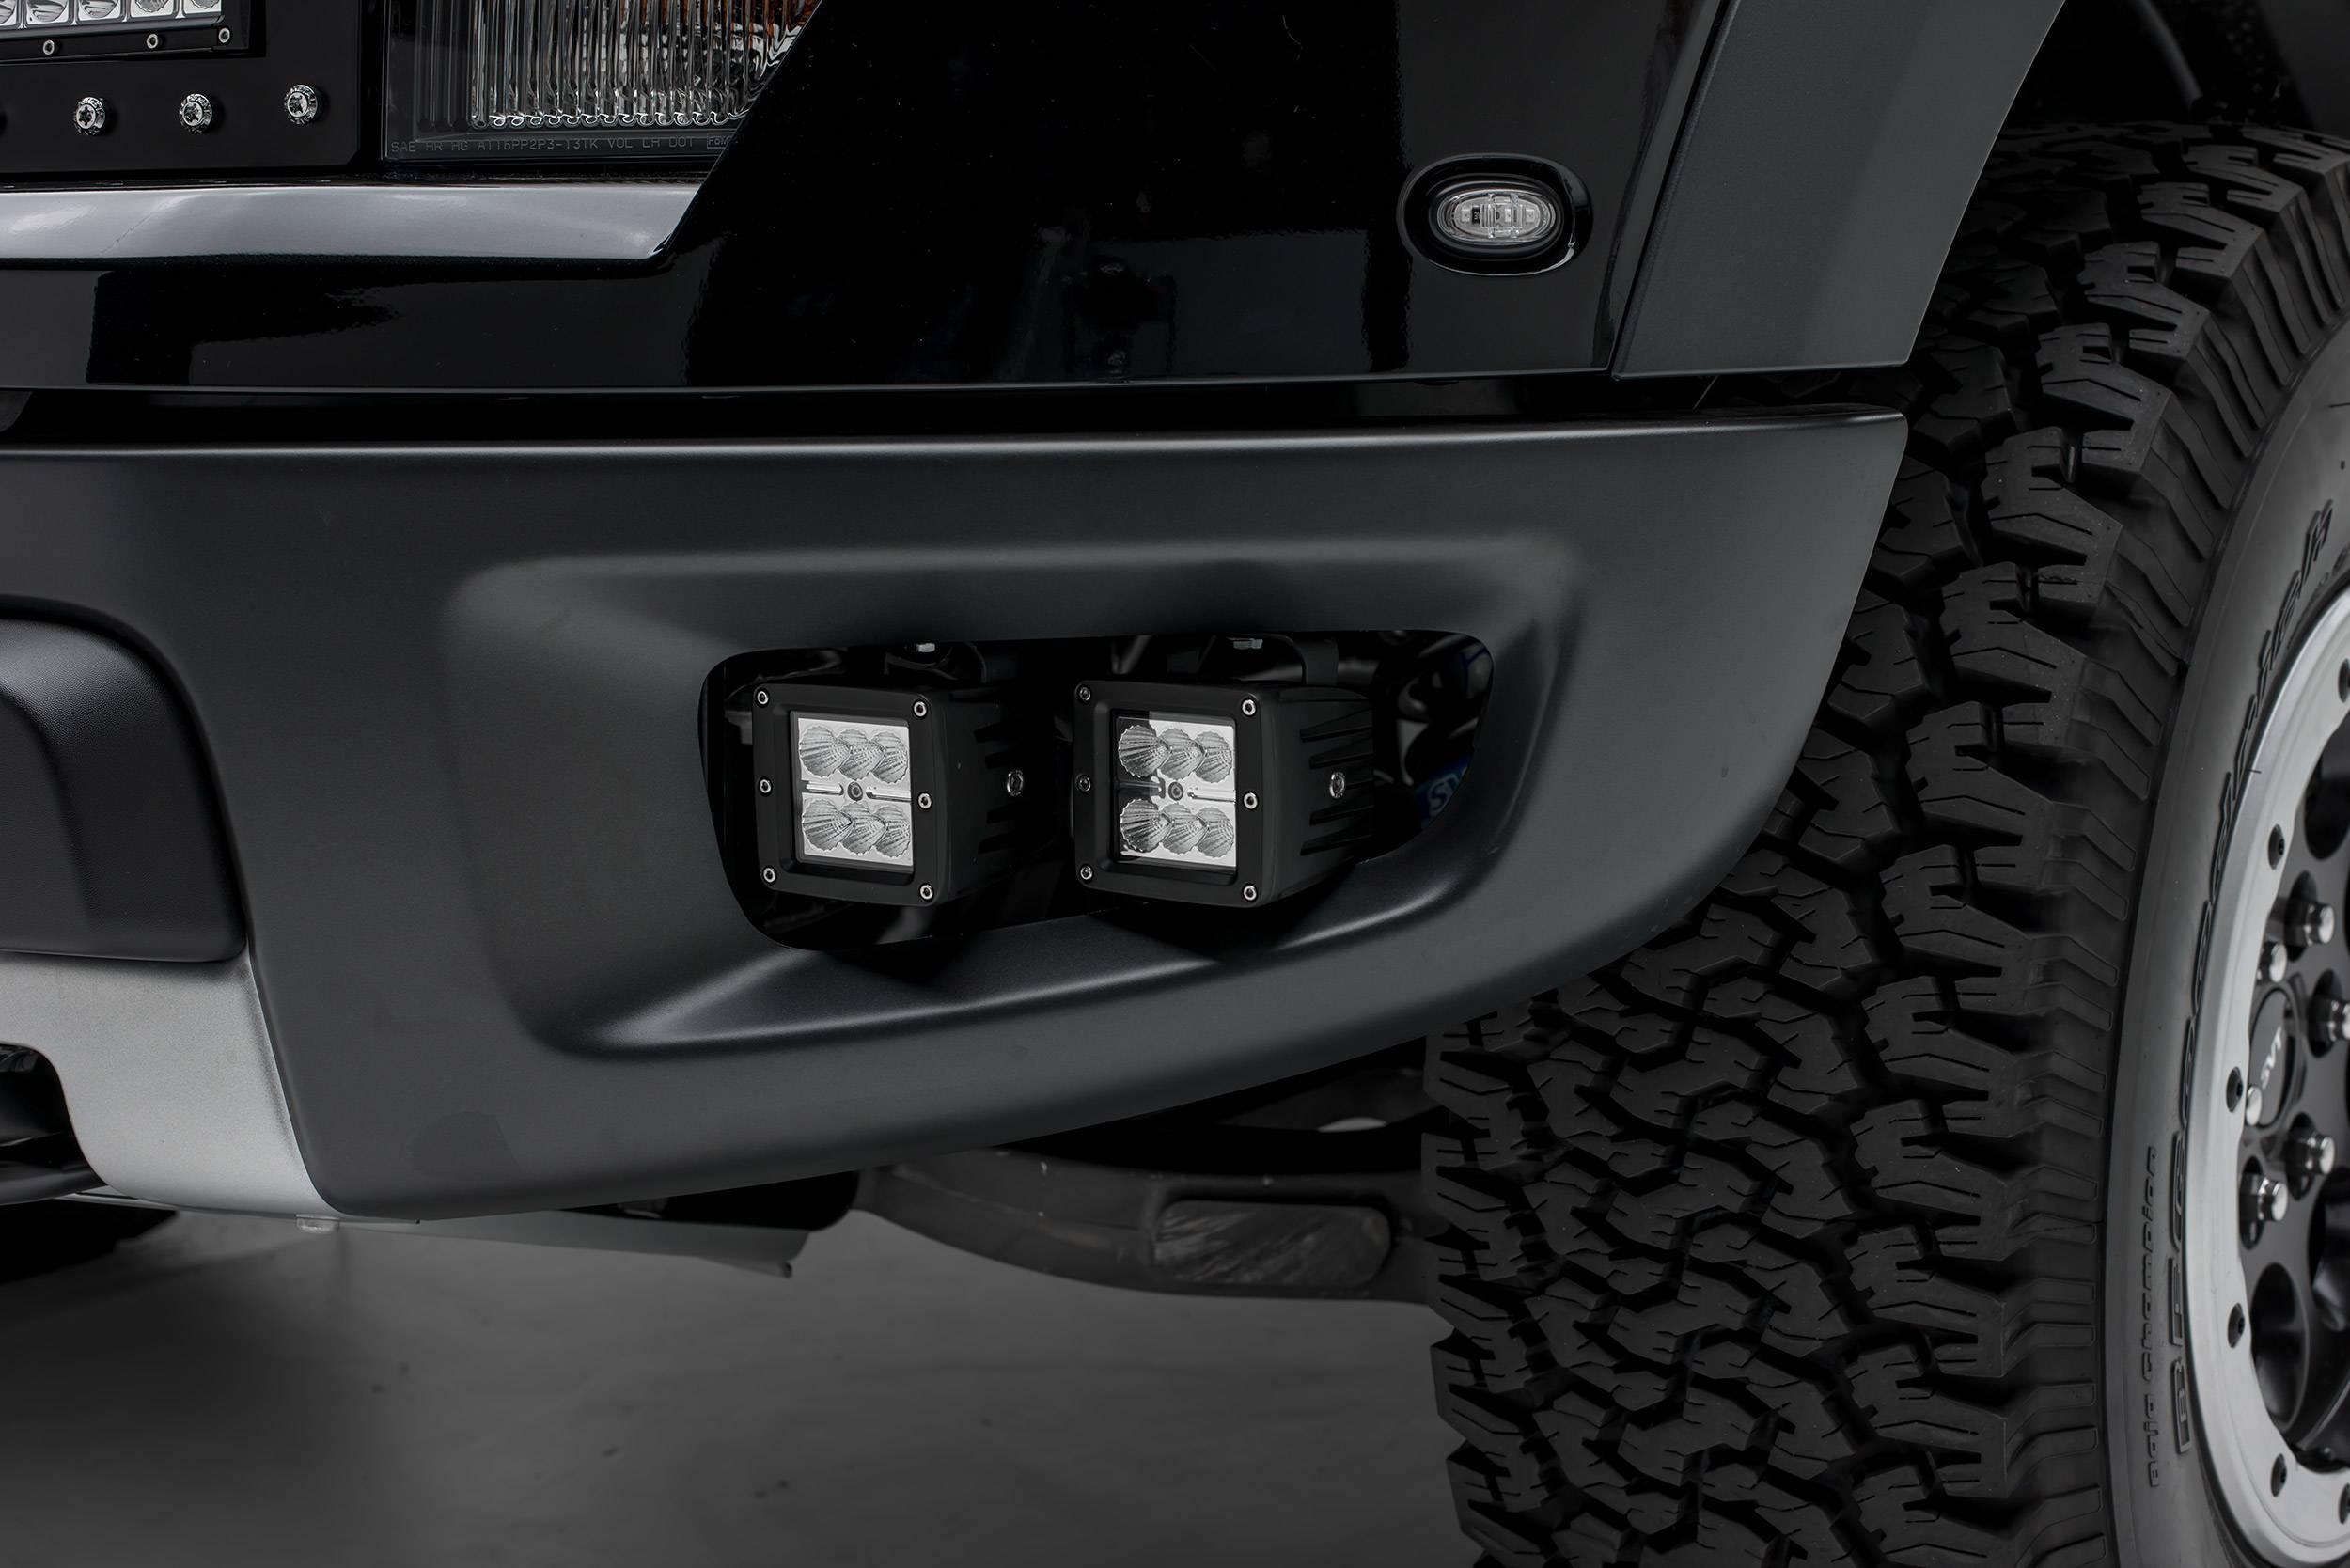 ZROADZ OFF ROAD PRODUCTS - 2010-2014 Ford F-150 Raptor Front Bumper OEM Fog LED Kit with (4) 3 Inch LED Pod Lights - PN #Z325671-KIT